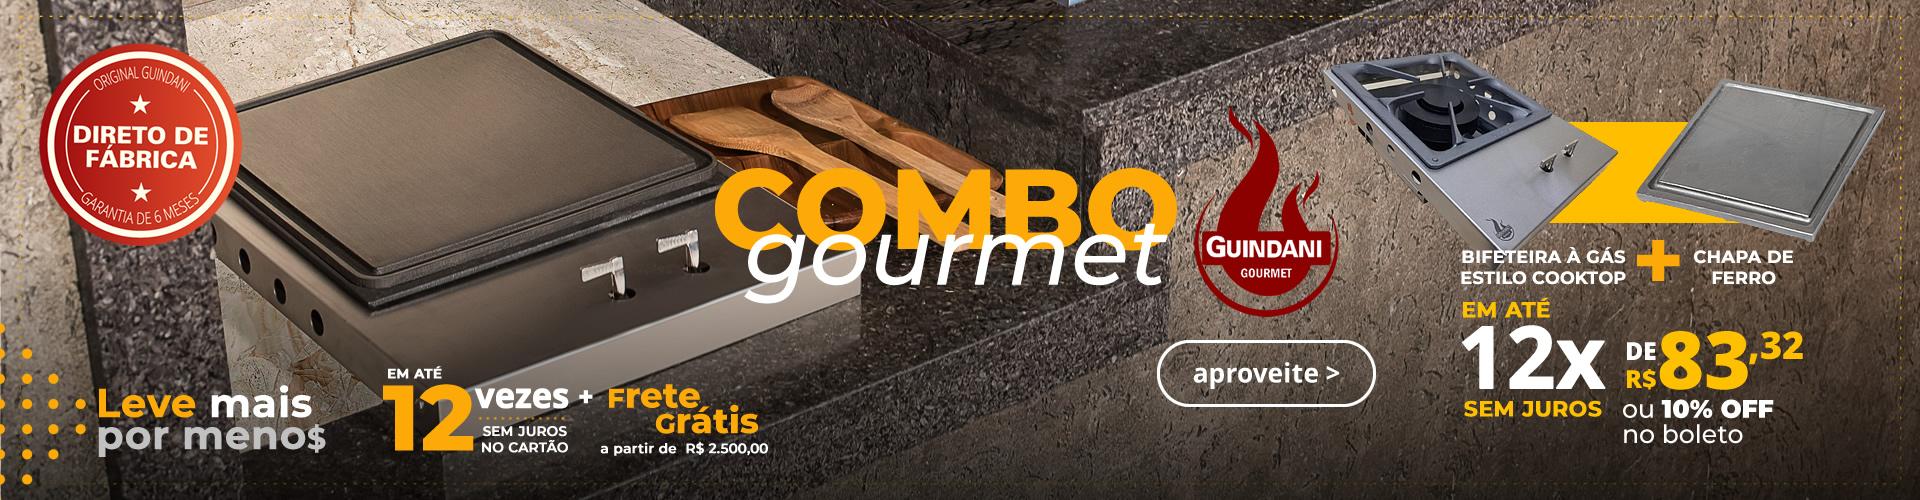 Combo Gourmet - Bif + Chapa